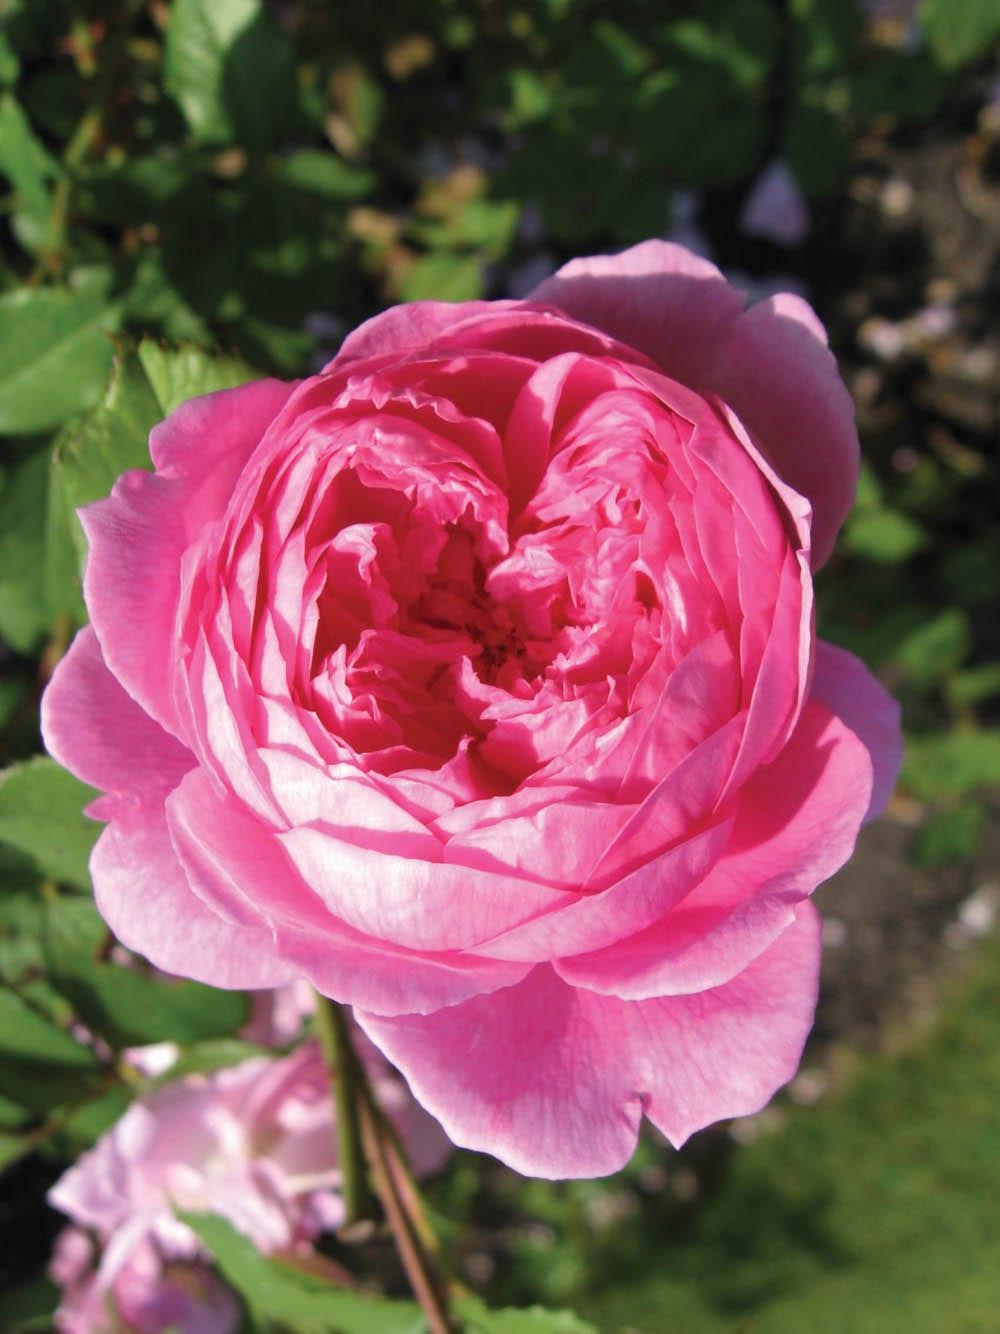 A dark-pink David Austin rose bloom.